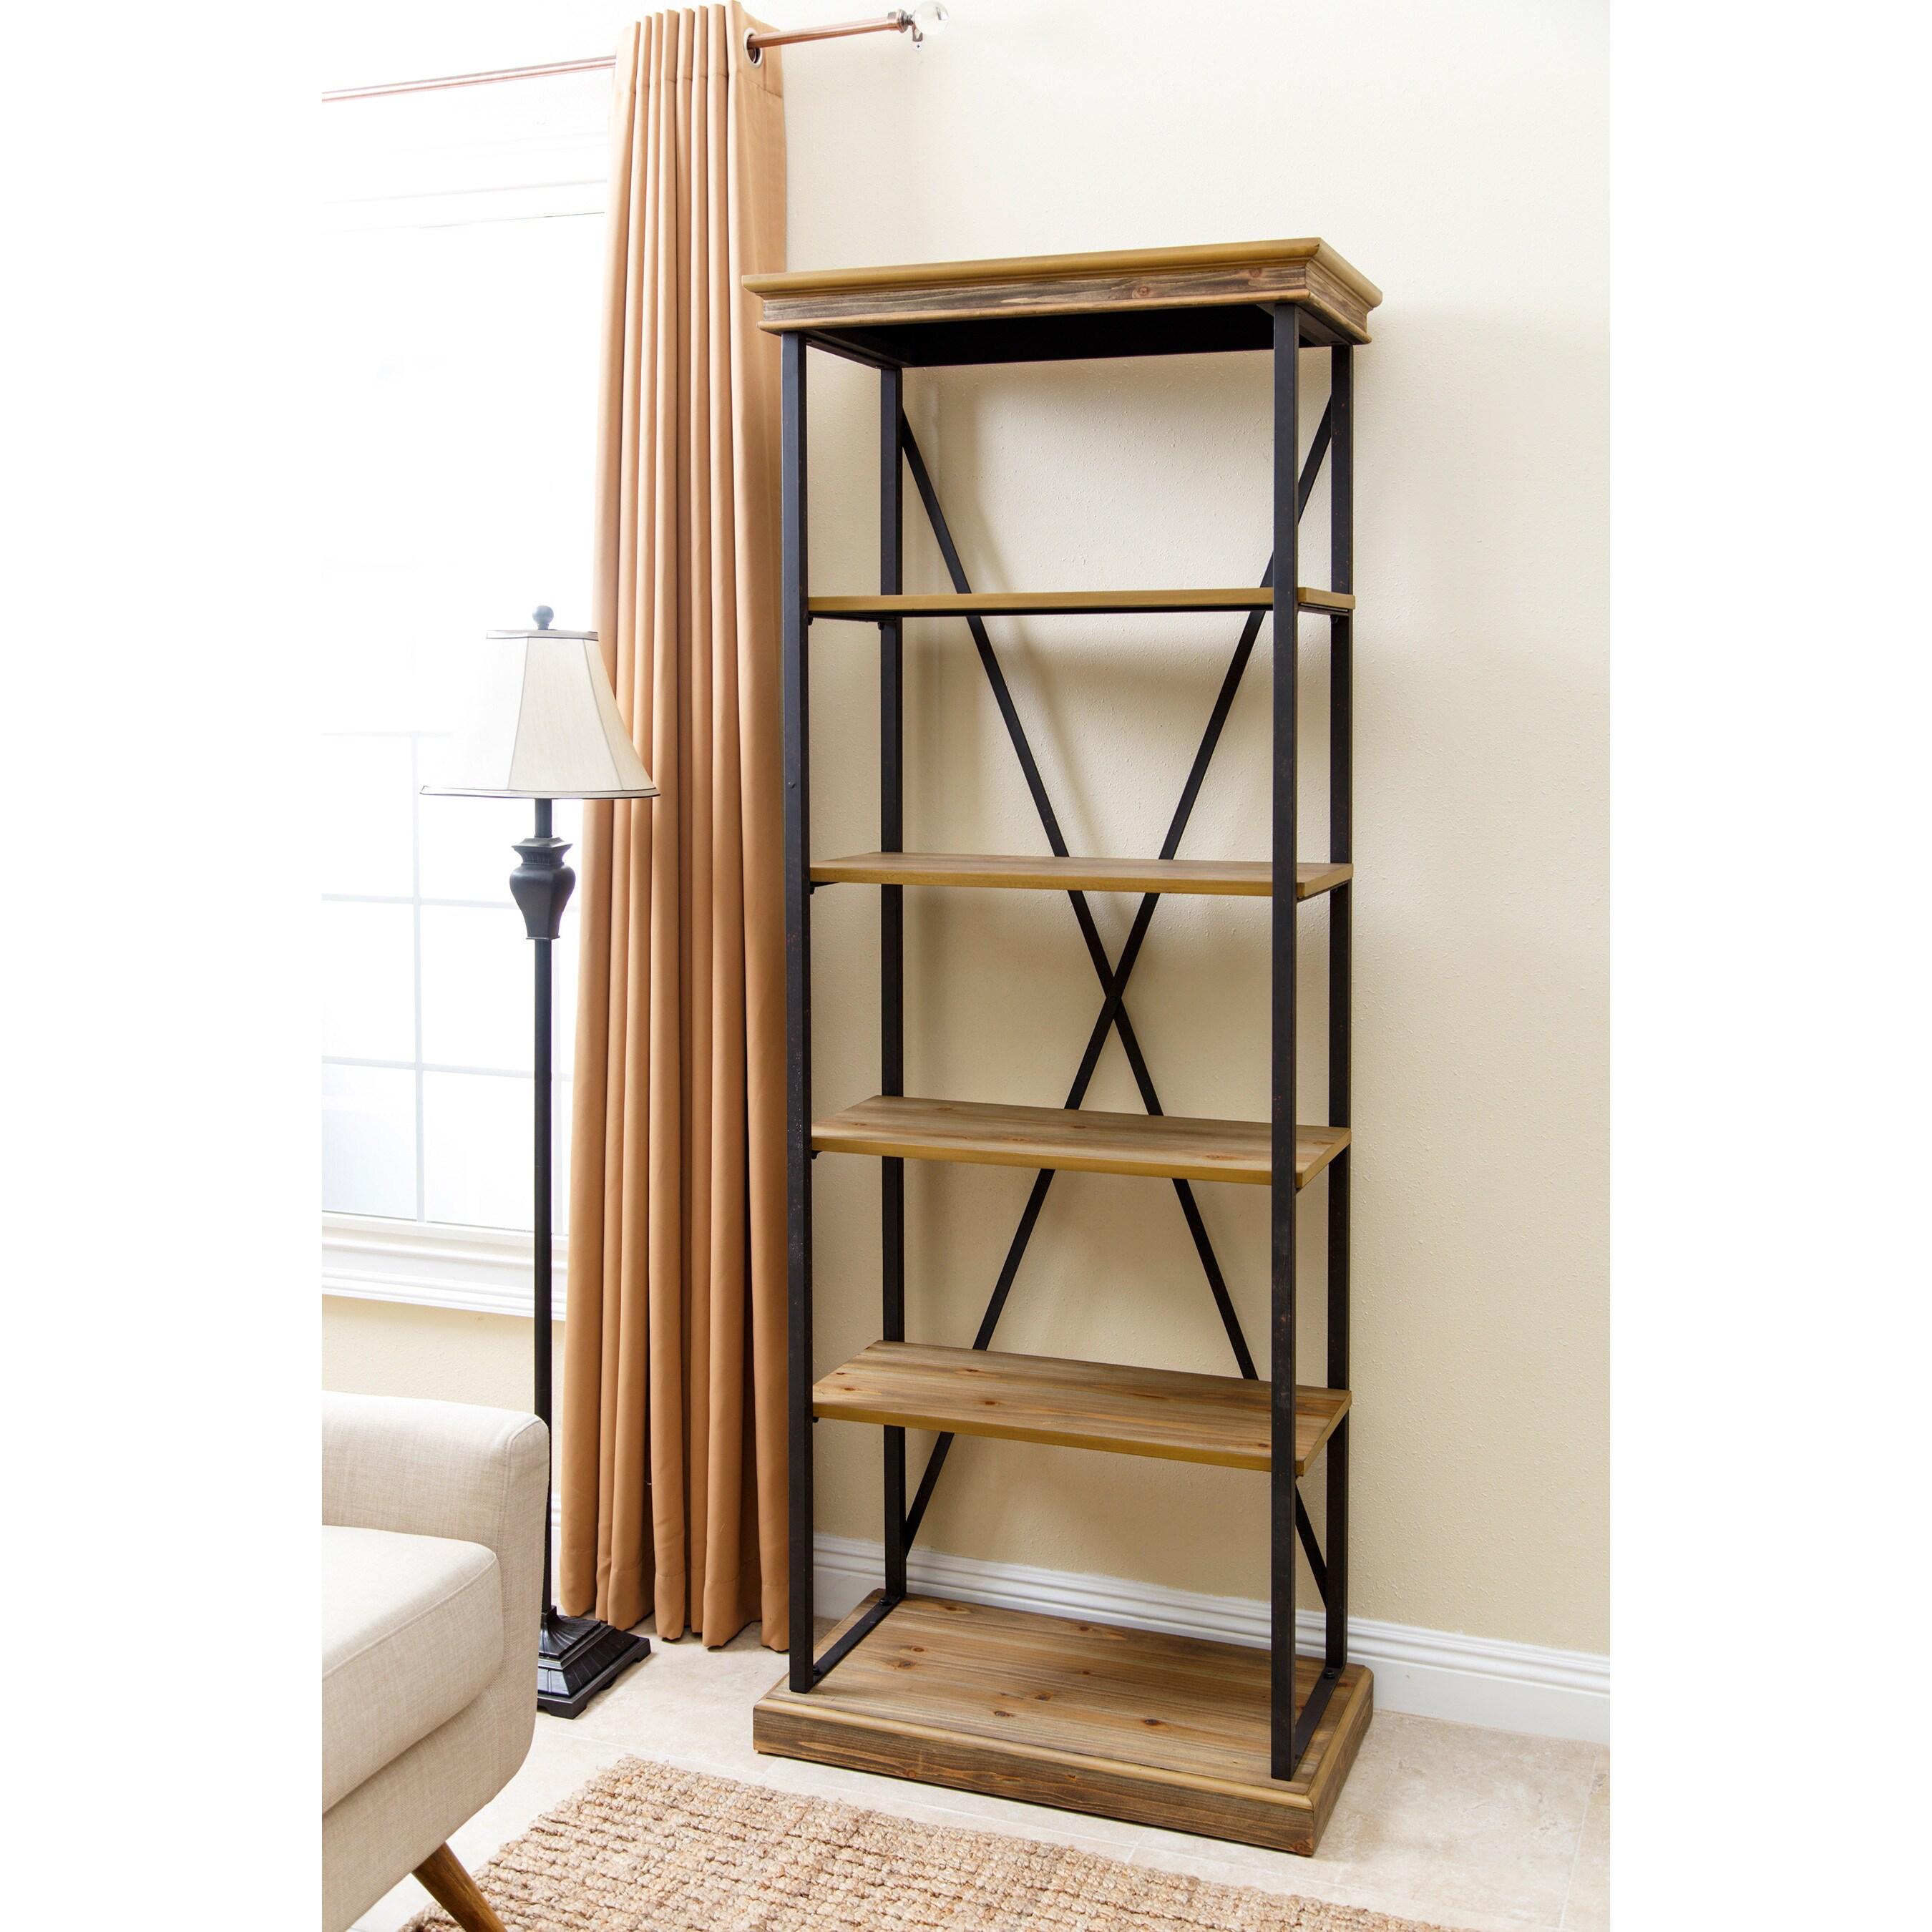 locker home metal engelbart and free carbon bookshelf product collection industrial bookcase shelf today shipping wood loft garden overstock door